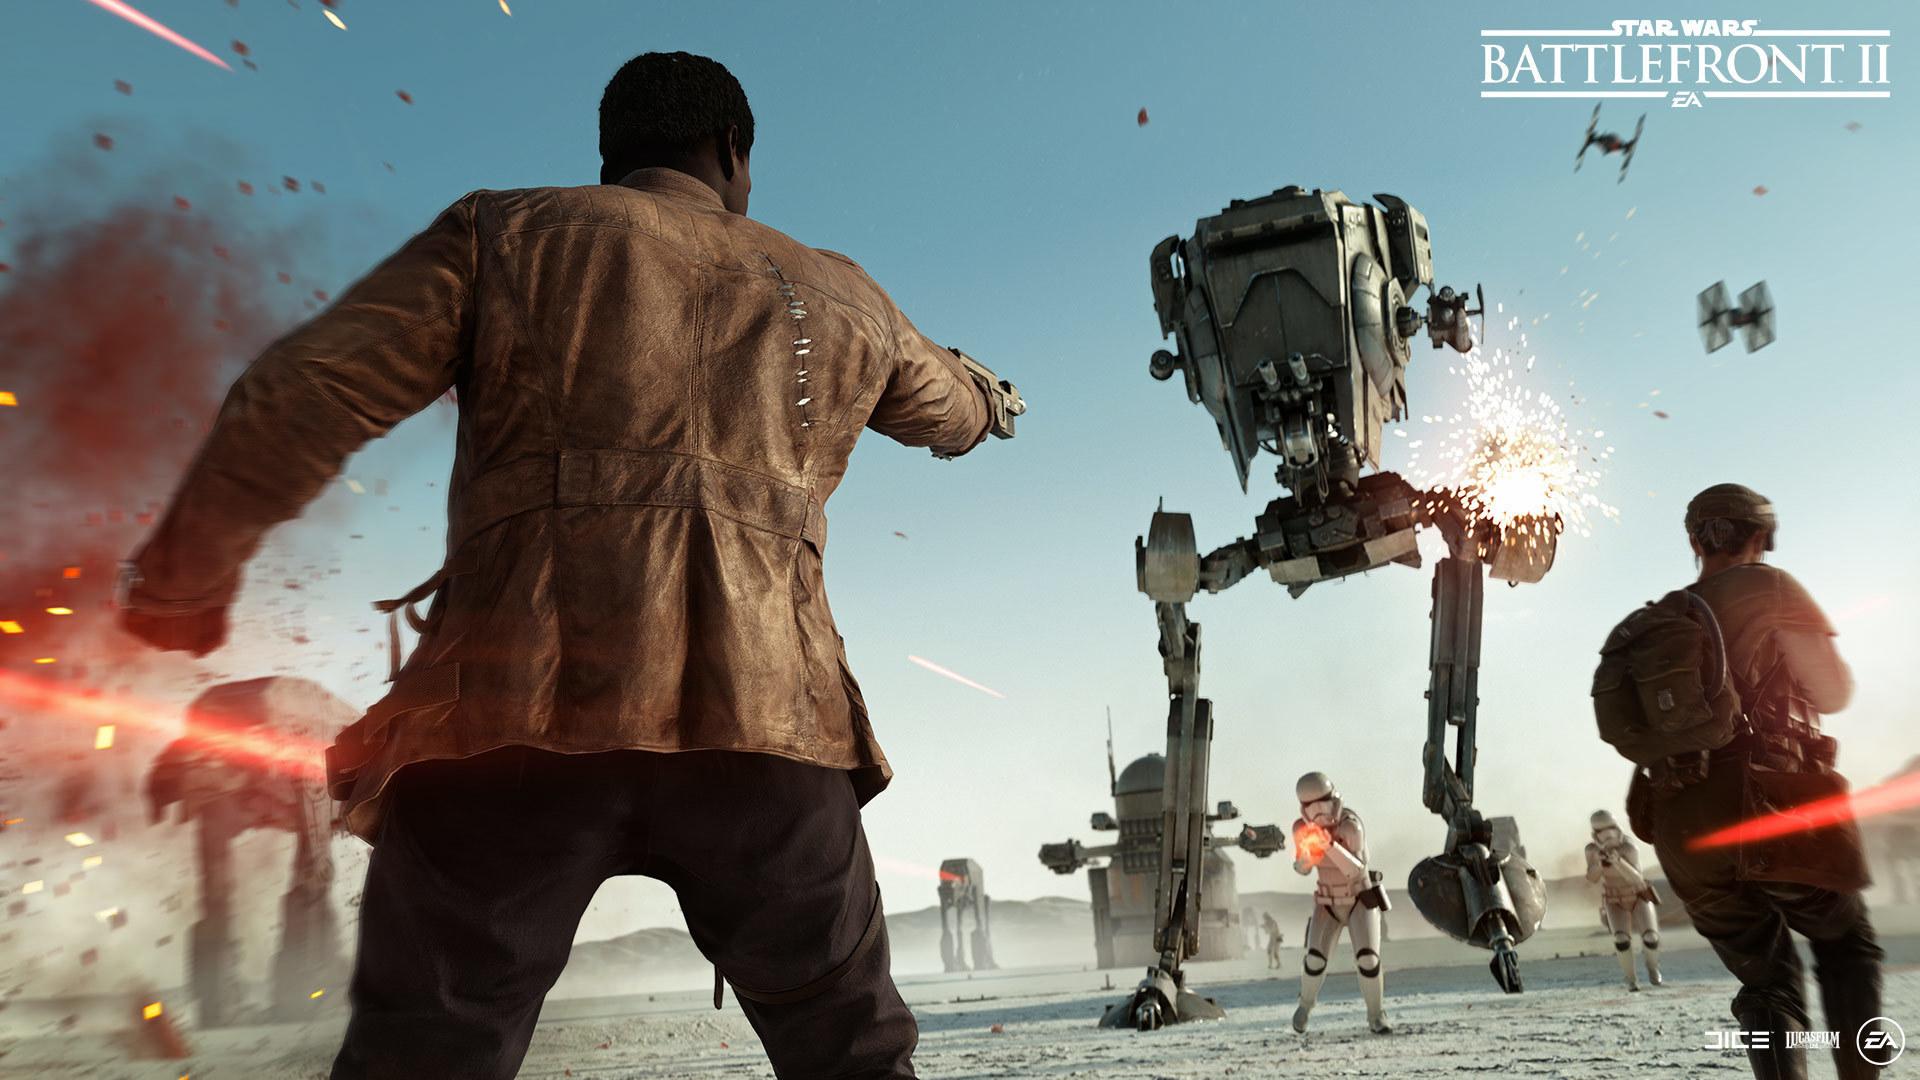 Star Wars BattleFront 2 Resurrection DLC The Last Jedi